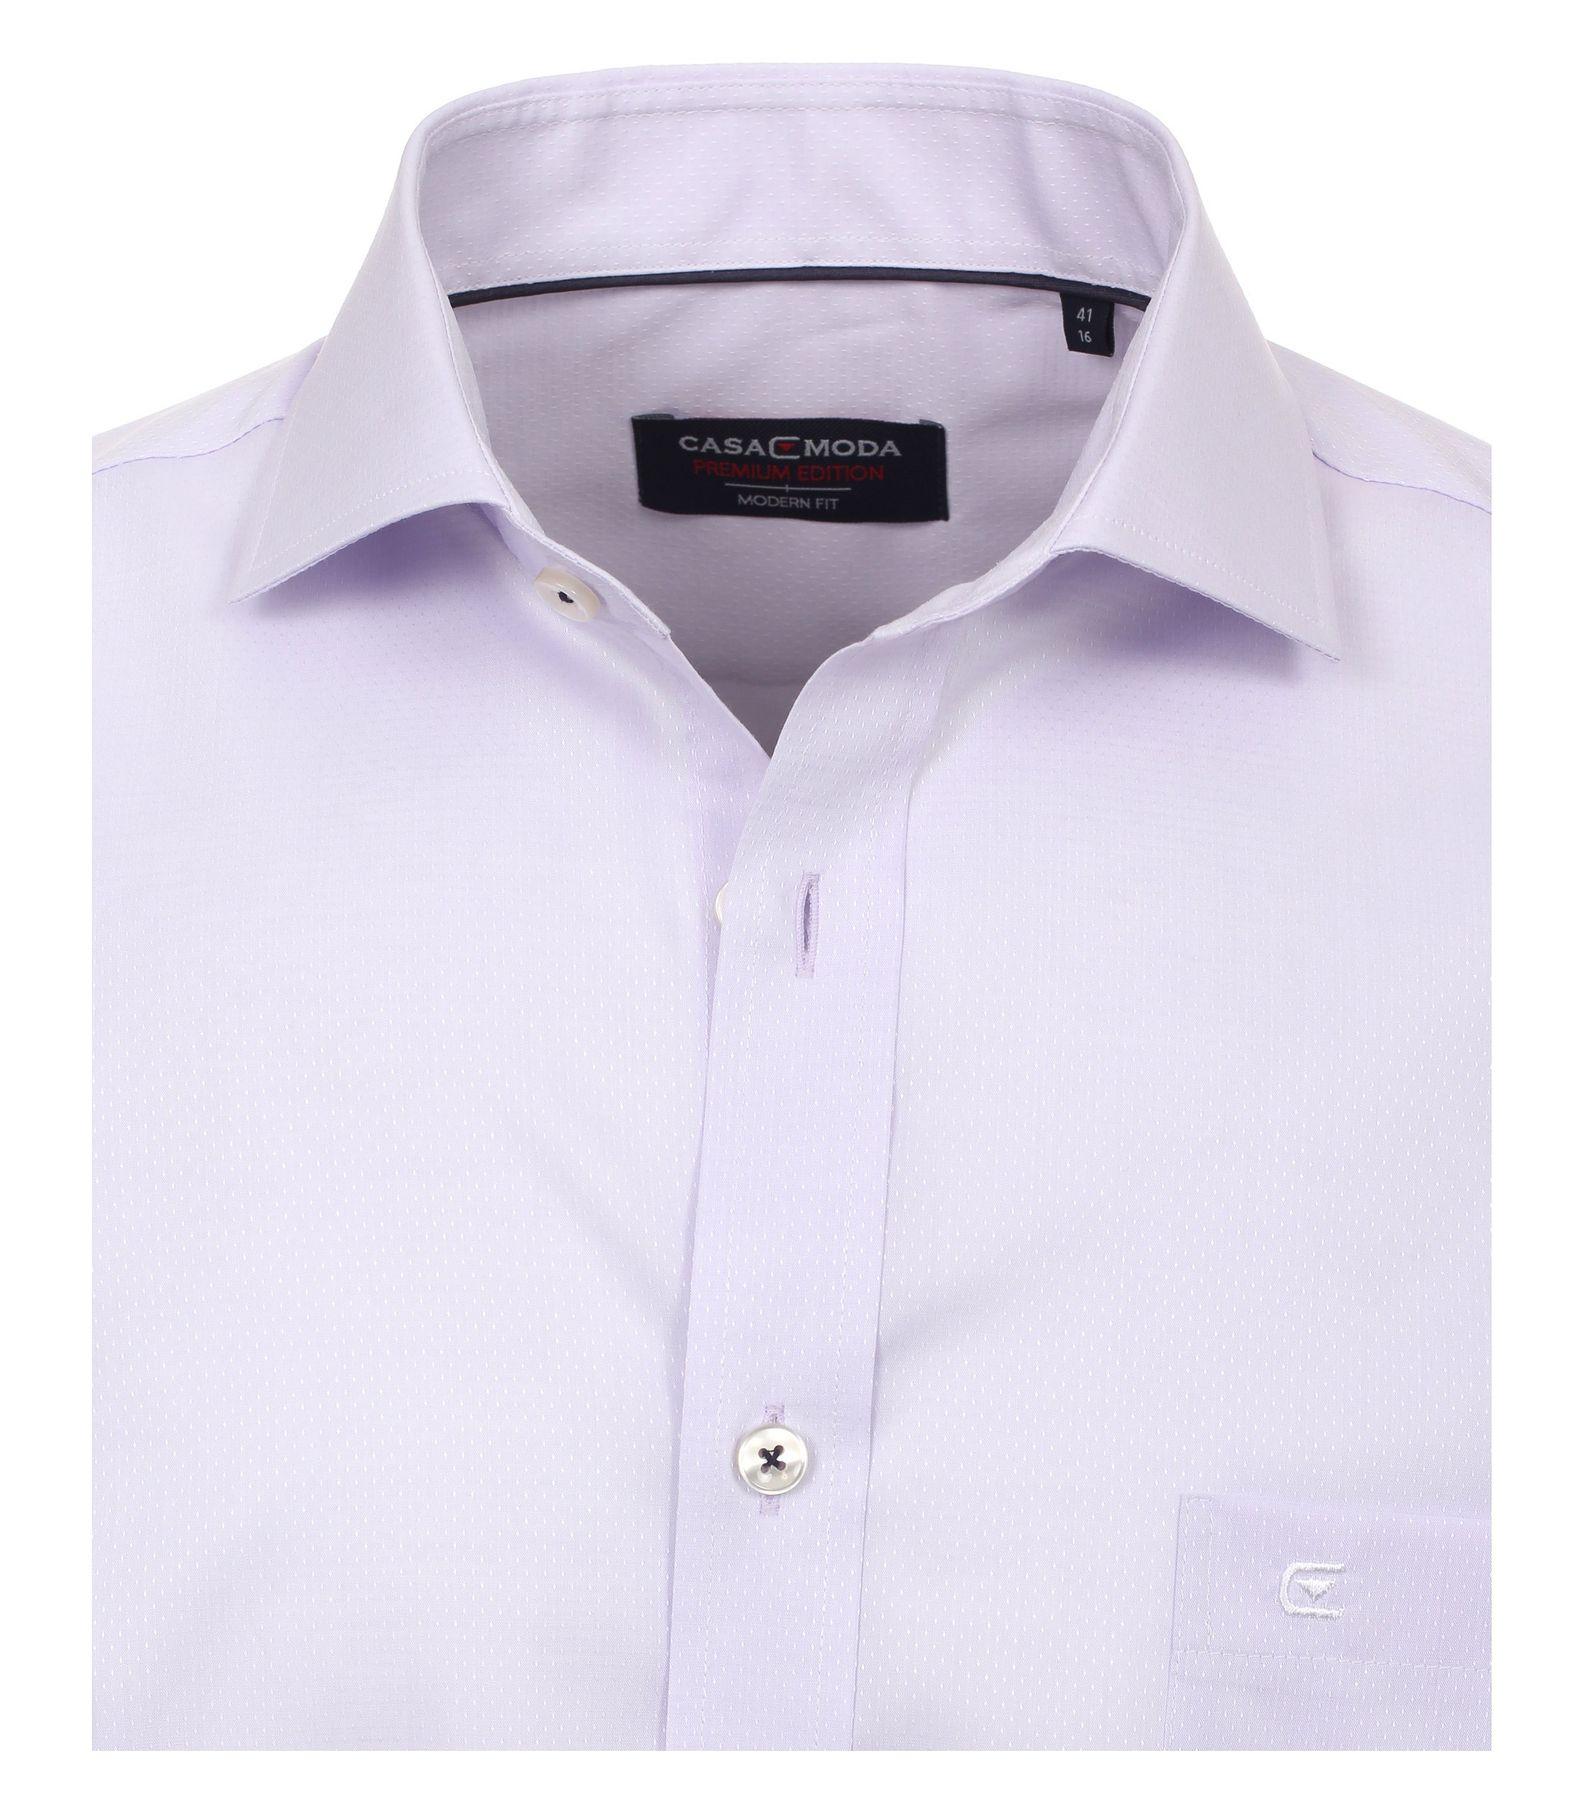 Casa Moda - Modern Fit - Herren langarm Hemd mit Shark Kragen, Uninah (372682600A) – Bild 19